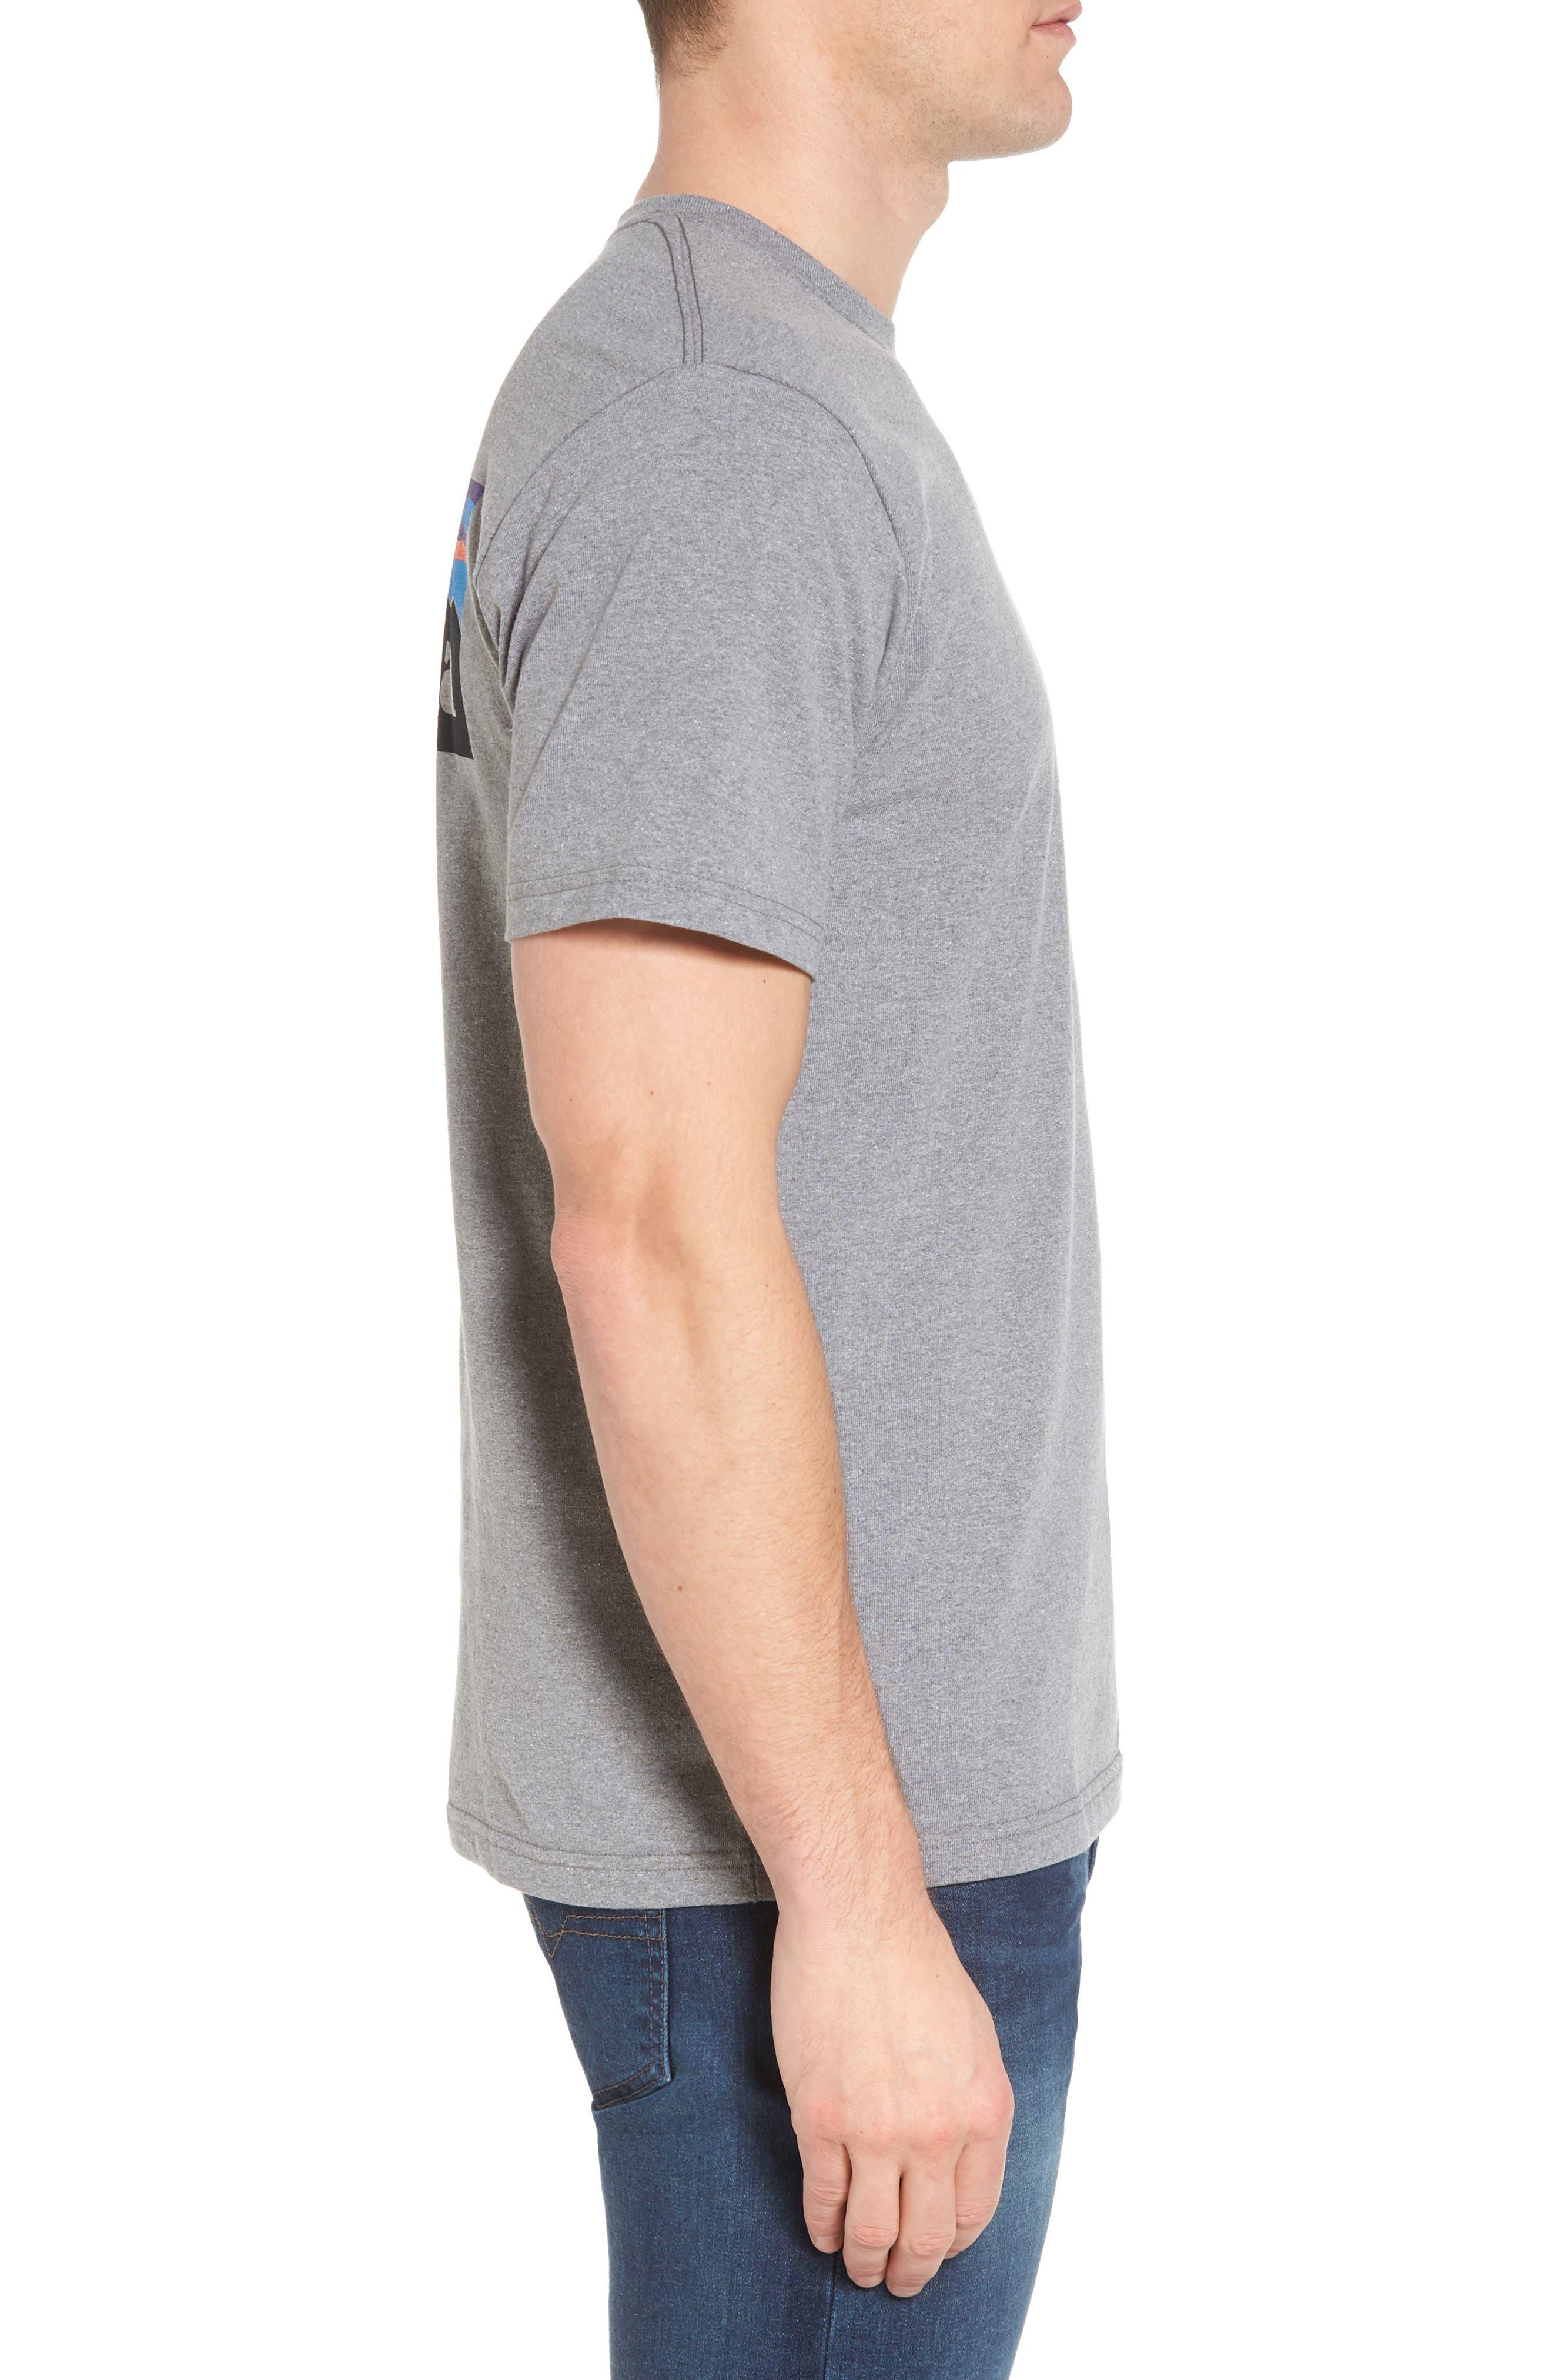 PATAGONIA, Responsibili-Tee T-Shirt, Alternate thumbnail 3, color, GRAVEL HEATHER